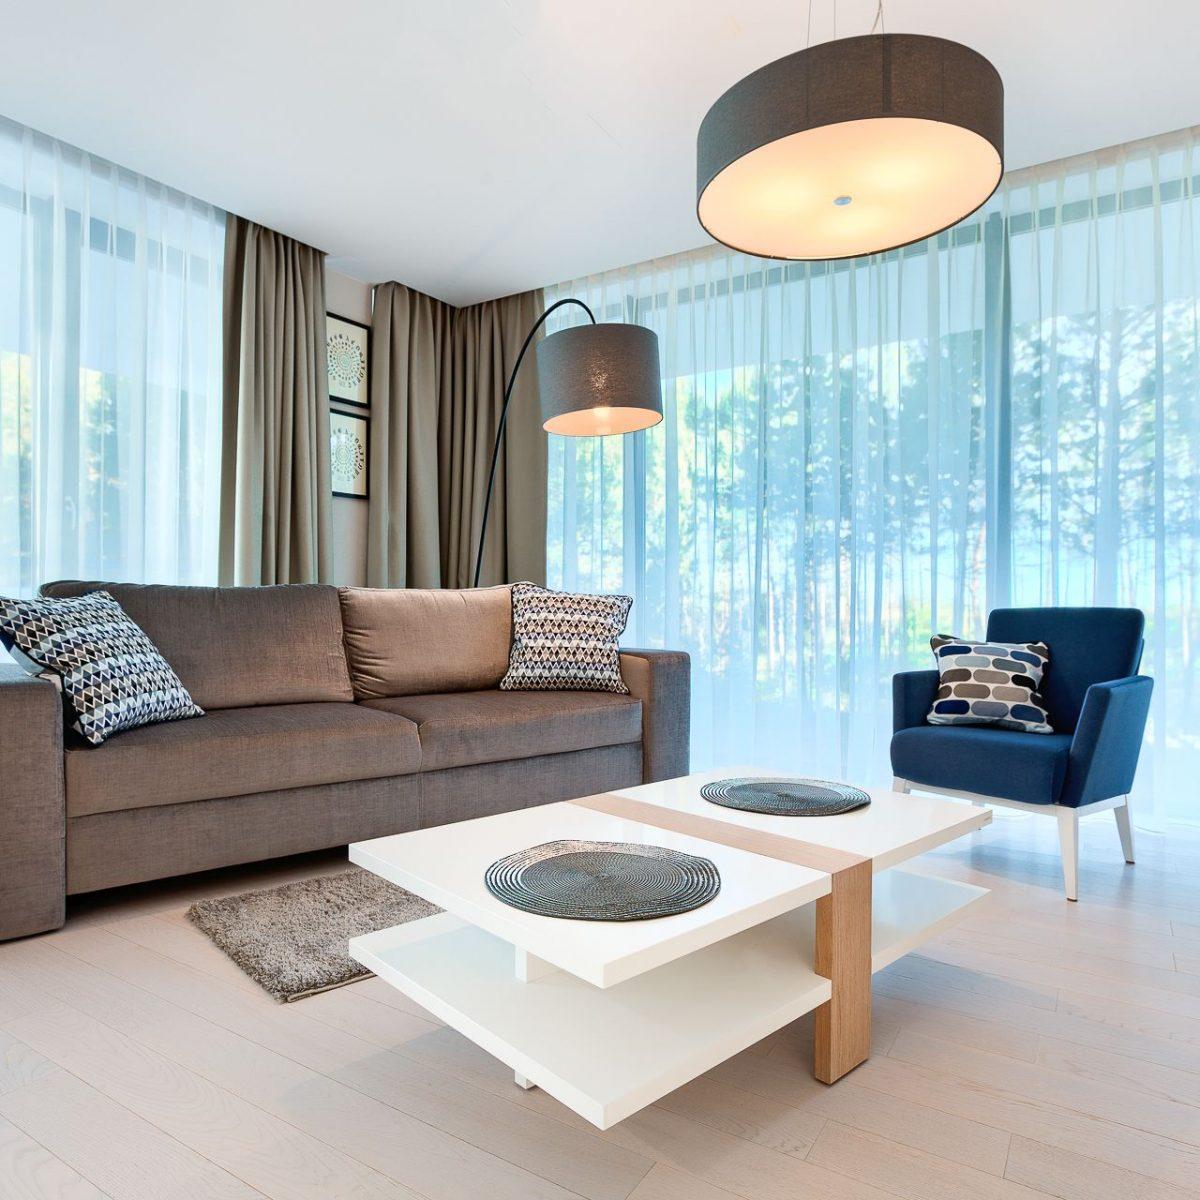 luksusowe apartamenty dune mielno z basen